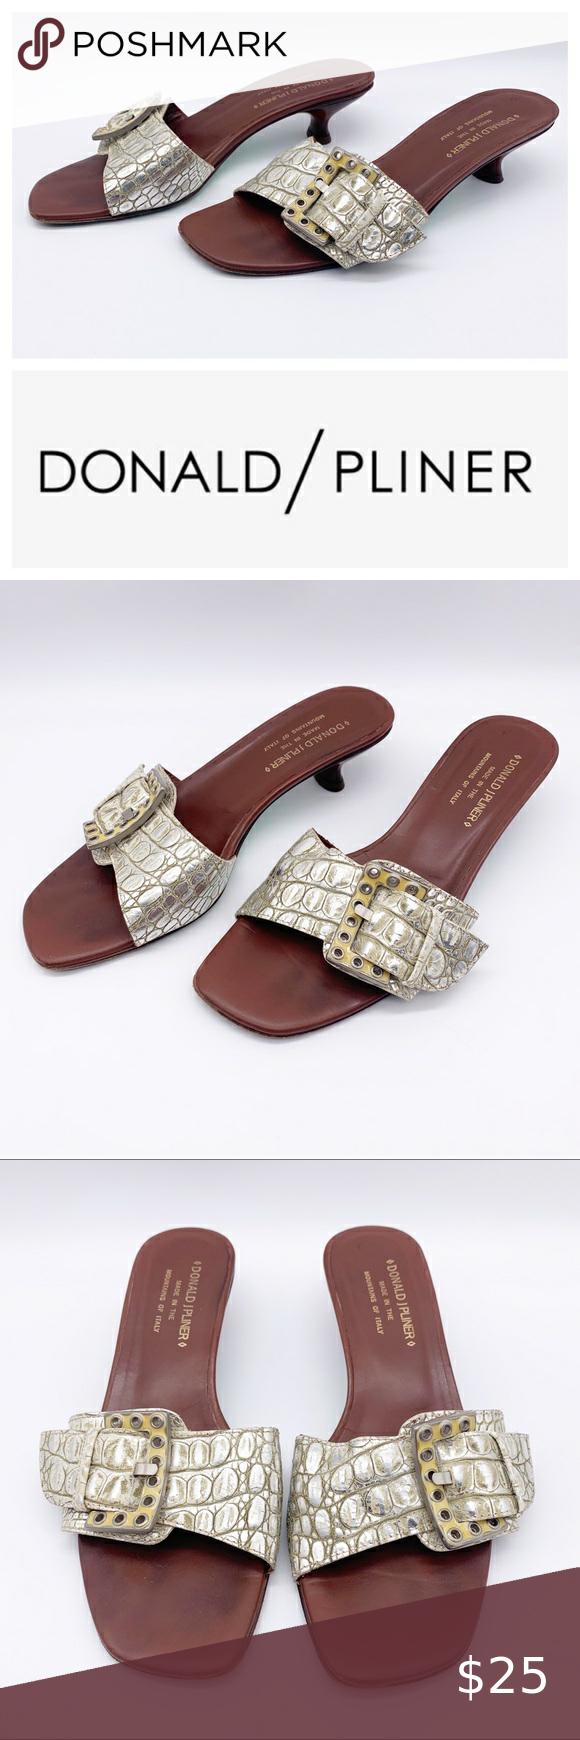 Donald J Pliner Joss Kitten Heel Silver Sandals In 2020 Kitten Heel Sandals Silver Sandals Silver Heels